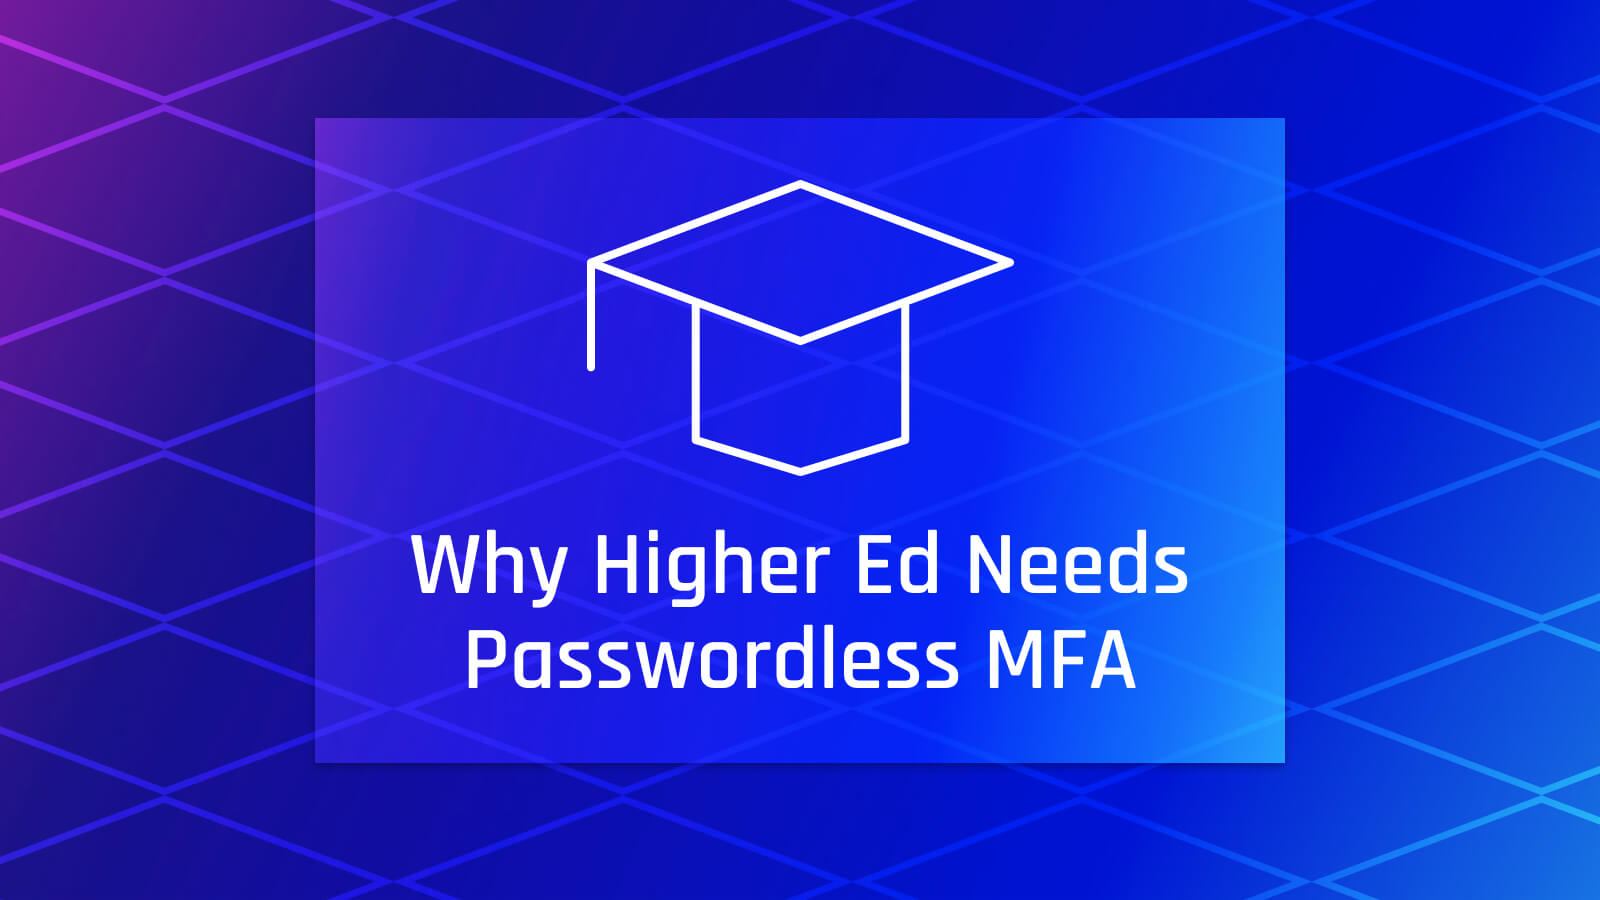 Higher Ed Needs Smarter Authentication Strategies